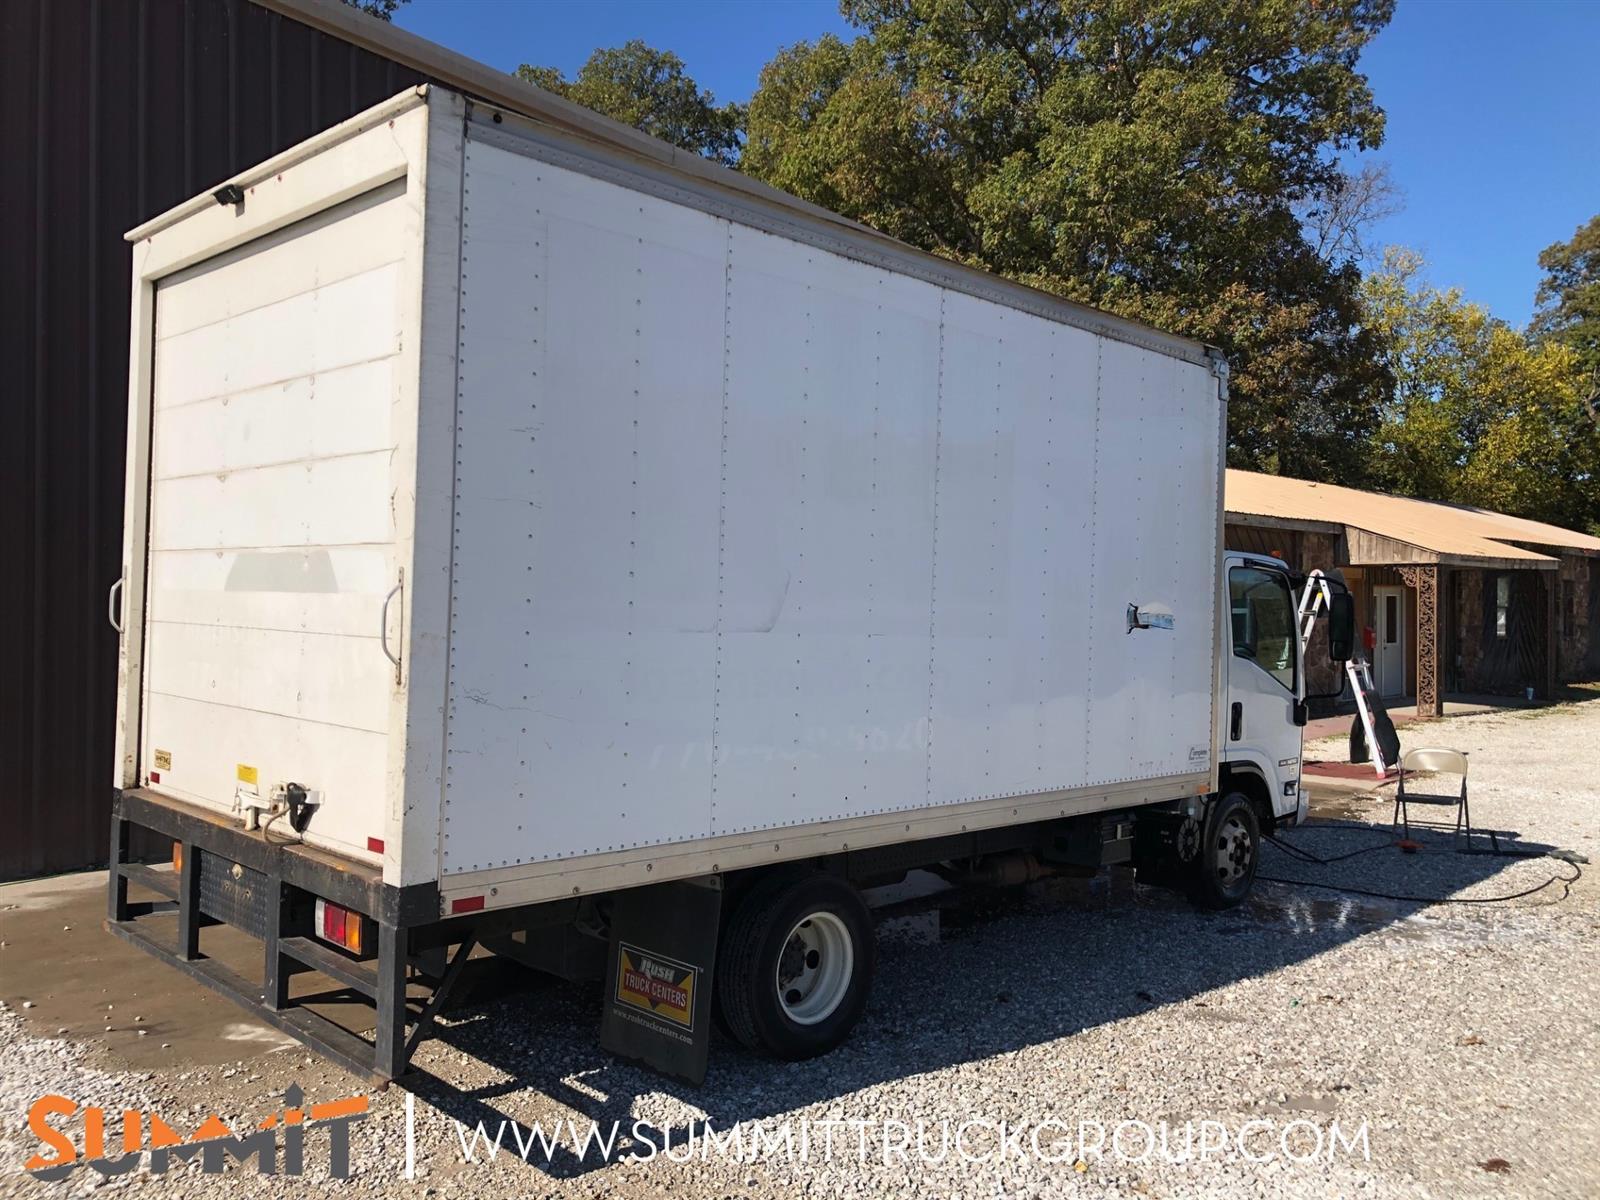 2016 Isuzu NPR Regular Cab 4x2, Dry Freight #150P201577 - photo 1